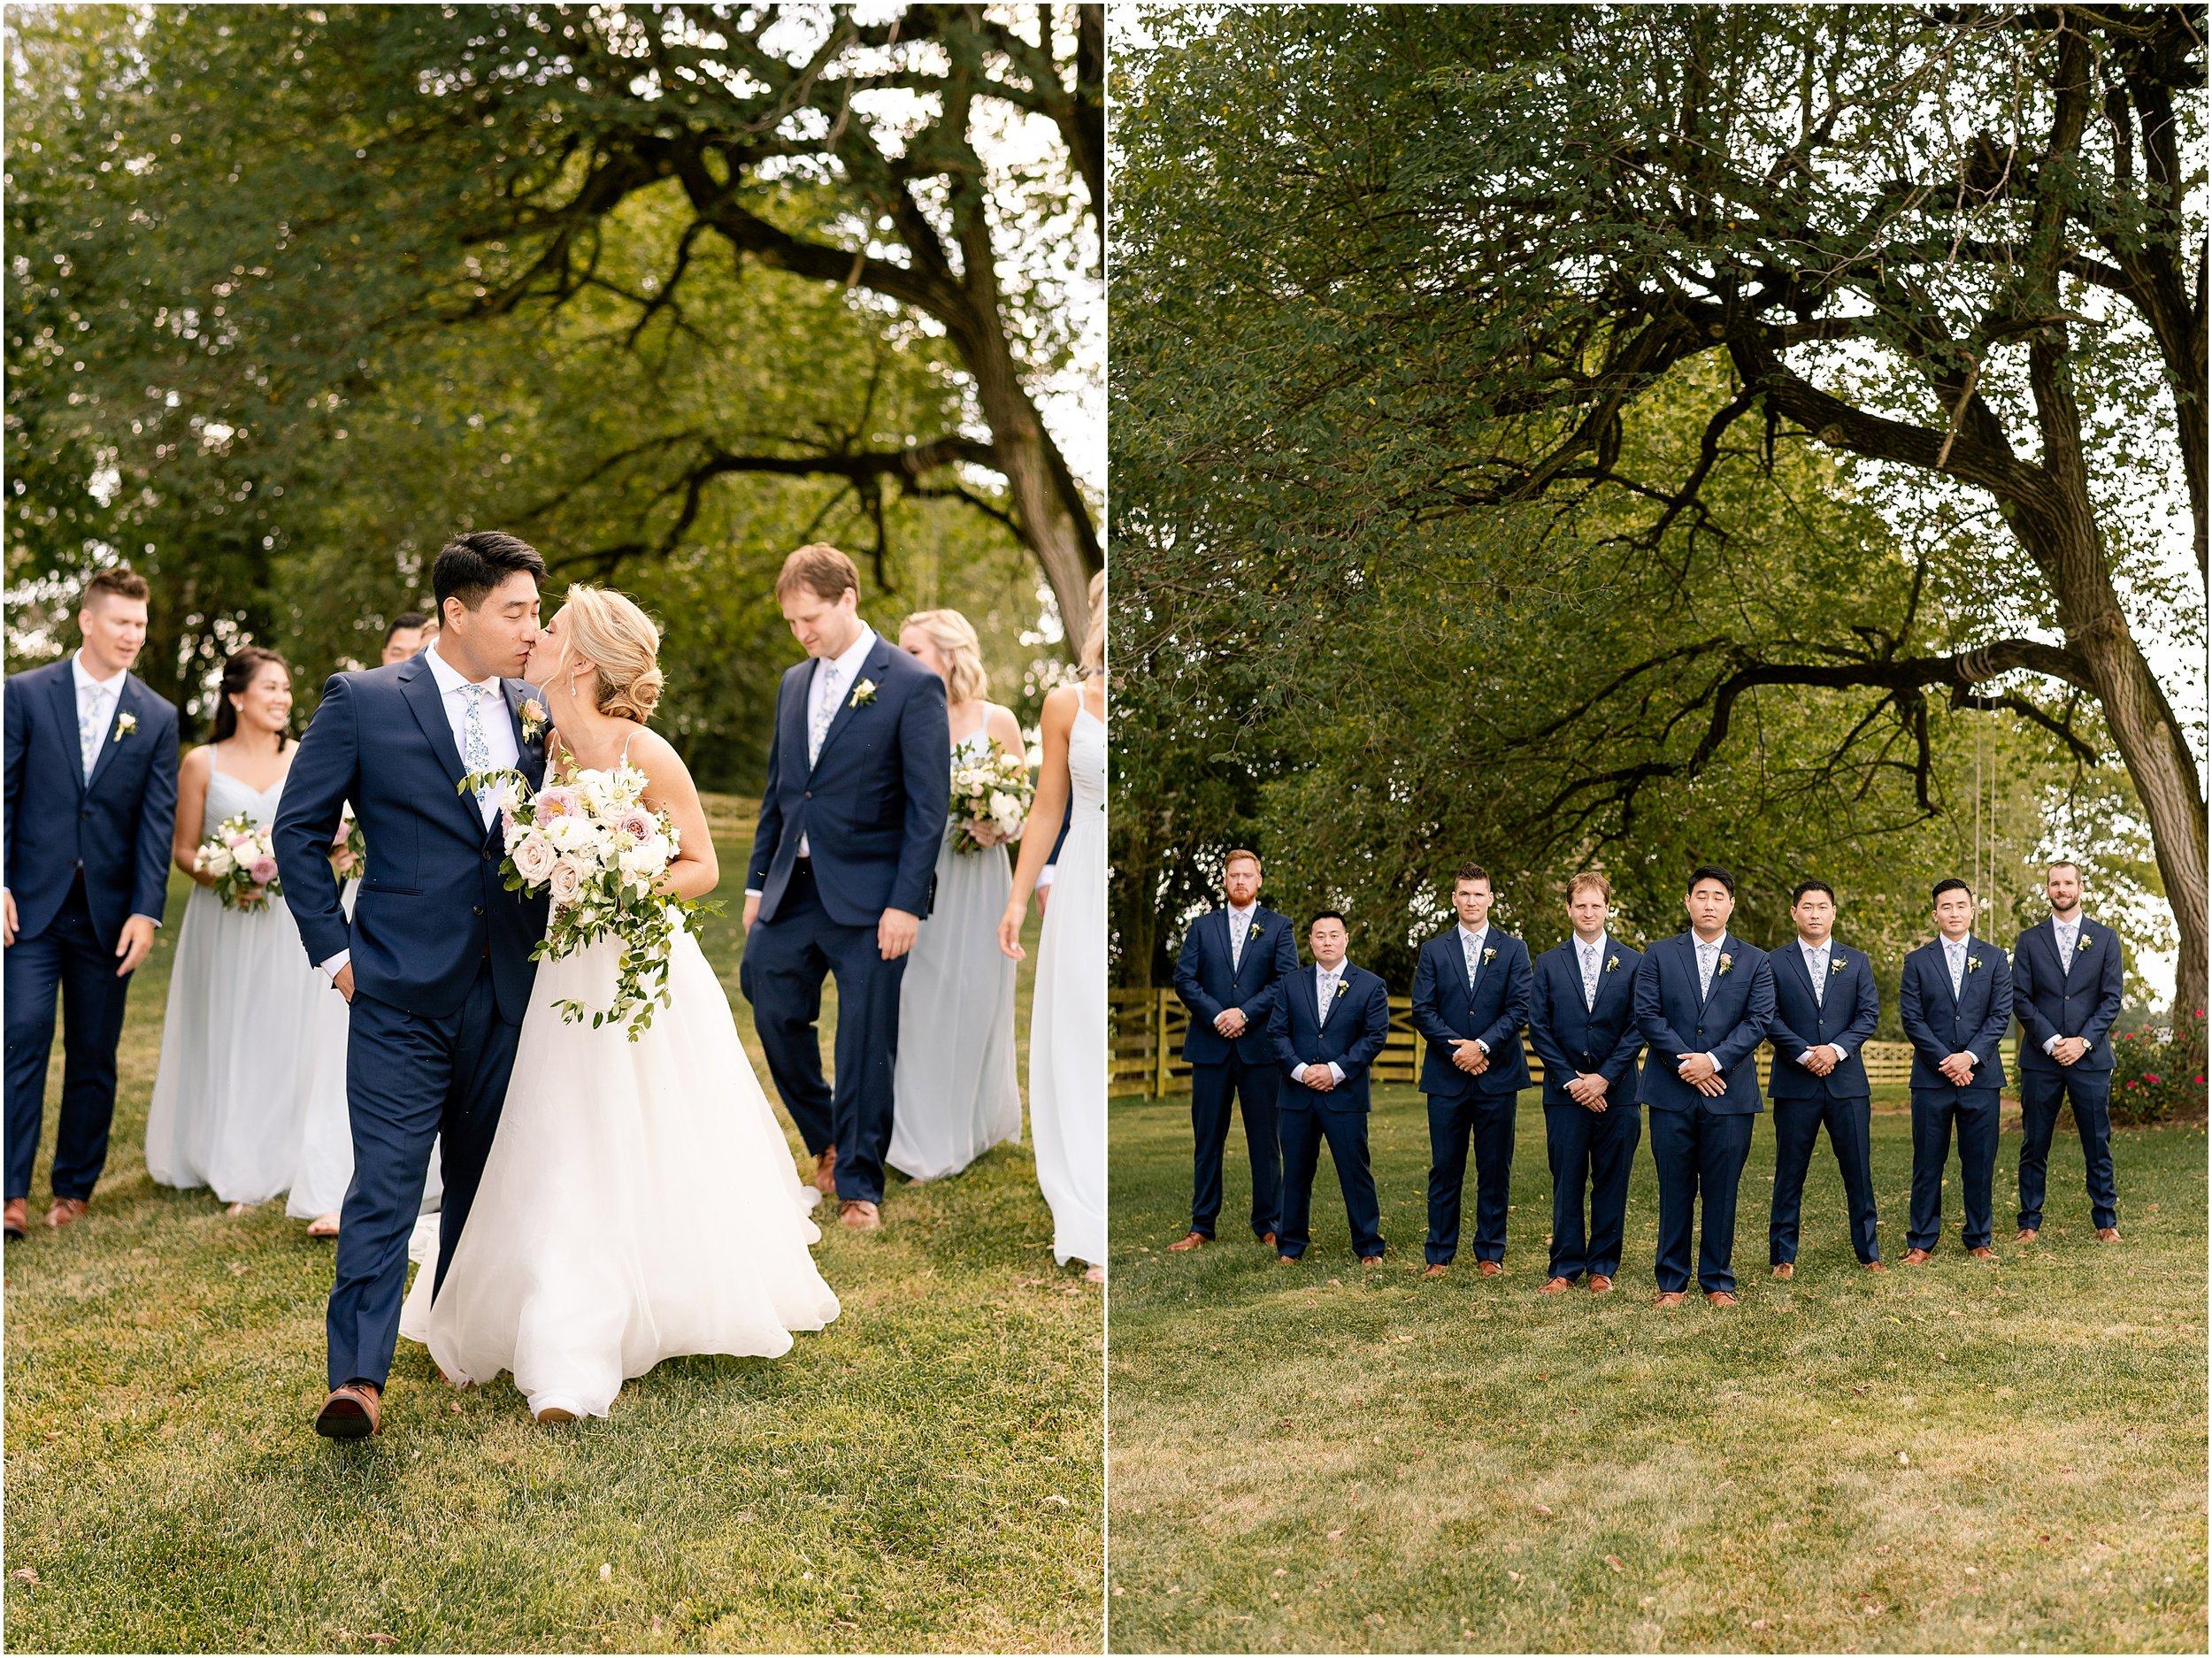 hannah leigh photography Walkers Overlook Wedding Walkersville MD_3514.jpg